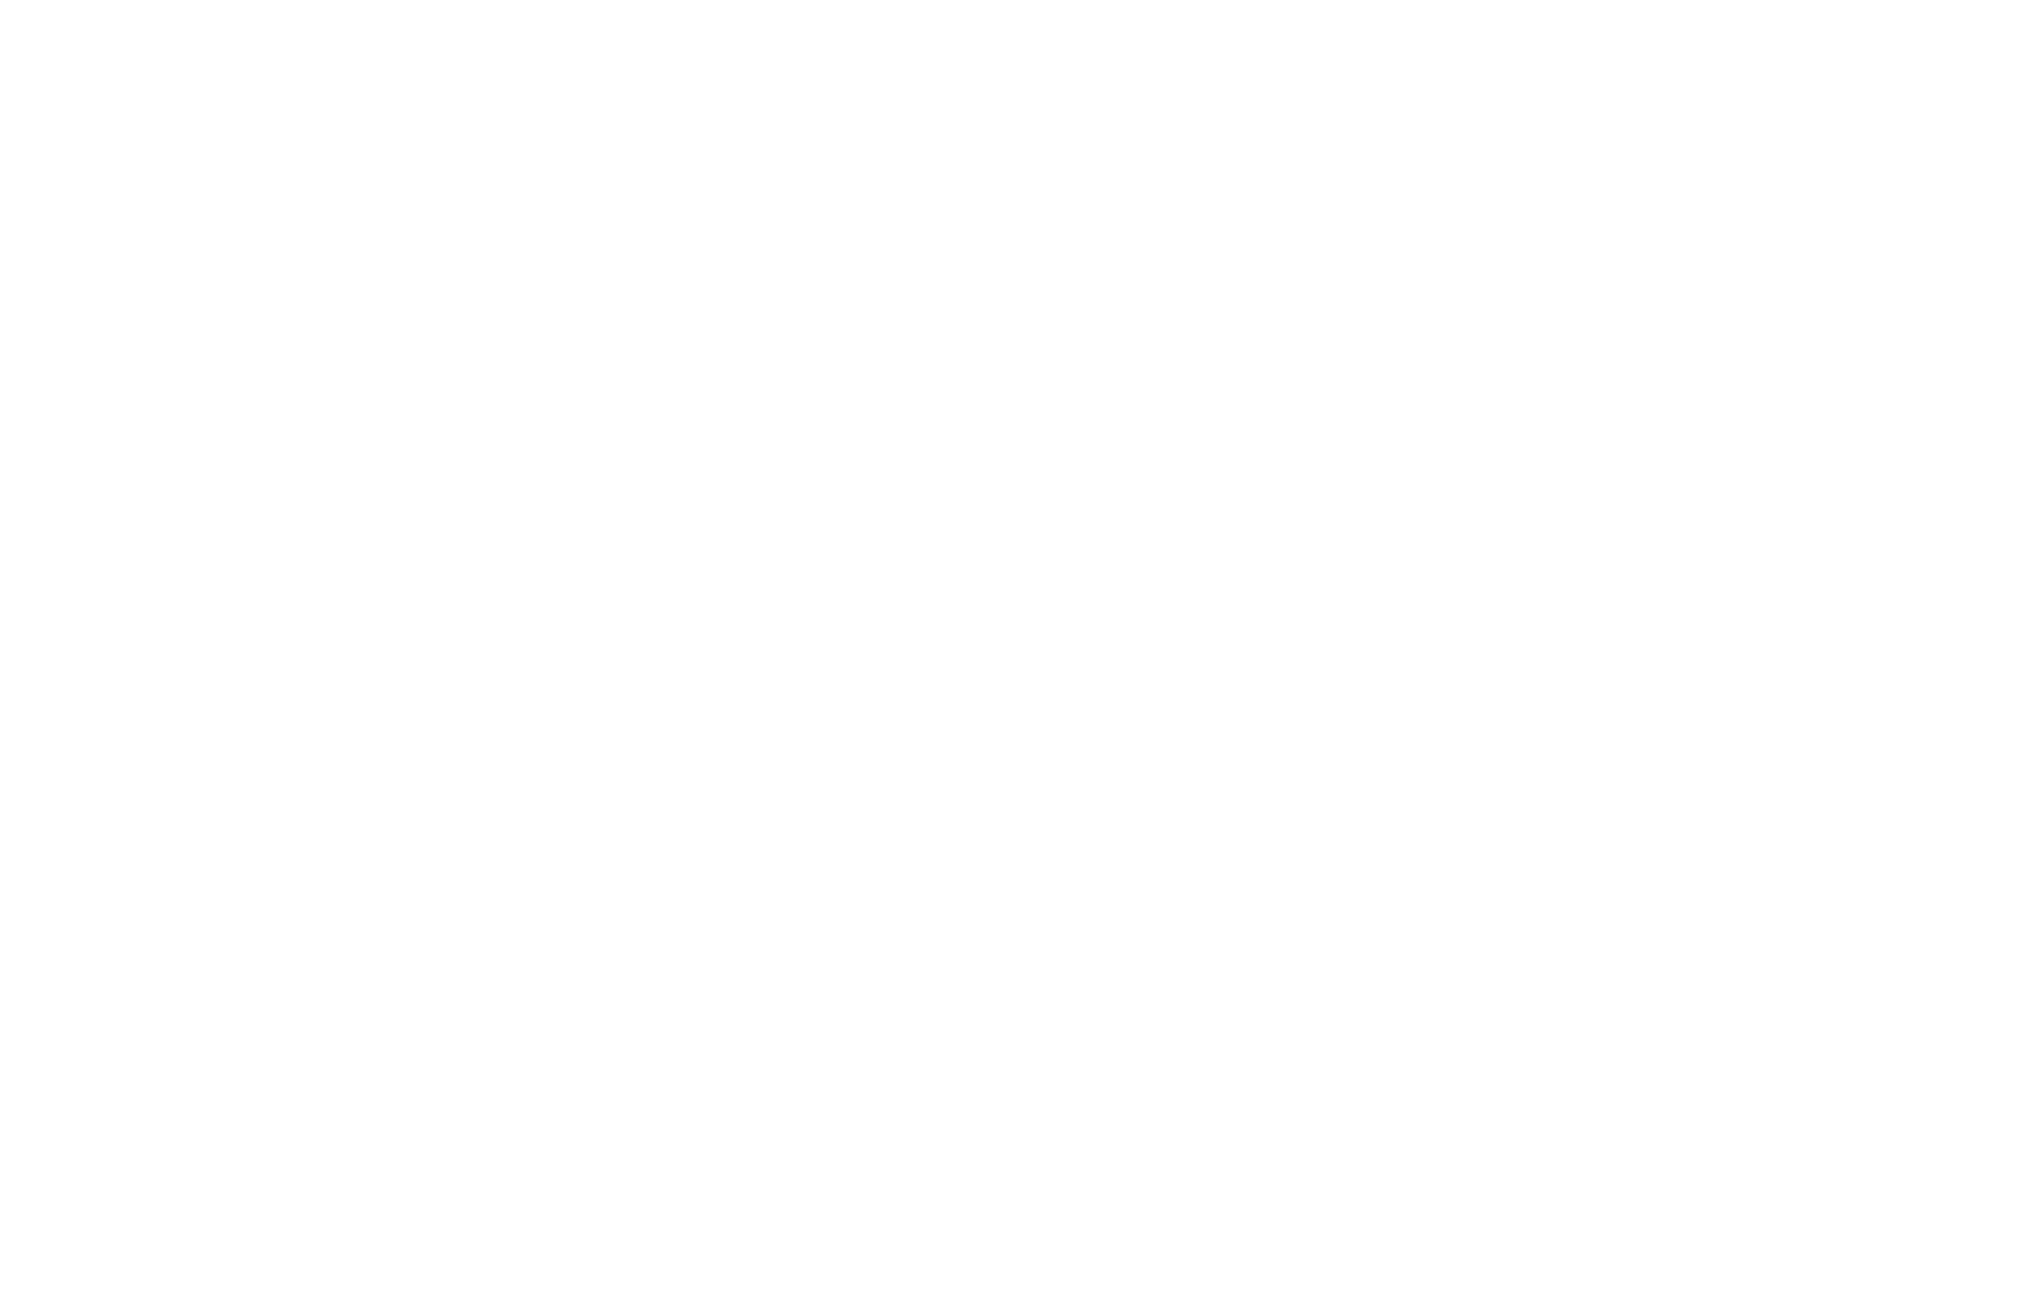 RifleBirdRecords_Logo_Jan8_2018.png